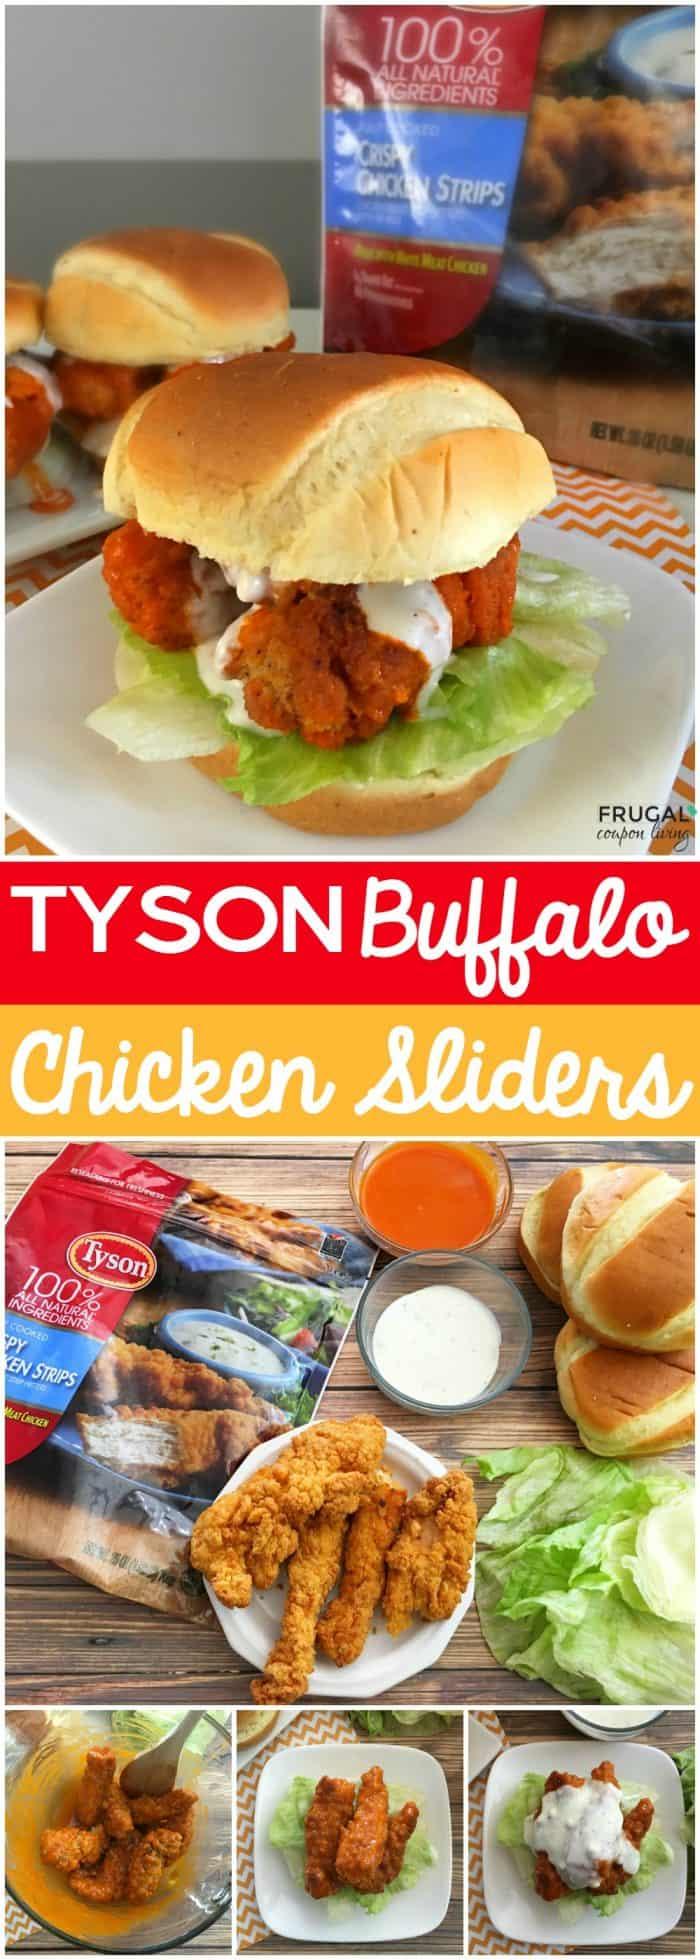 Tyson-Buffalo-Chicken-Slider-Recipe-Frugal-Coupon-Living-long